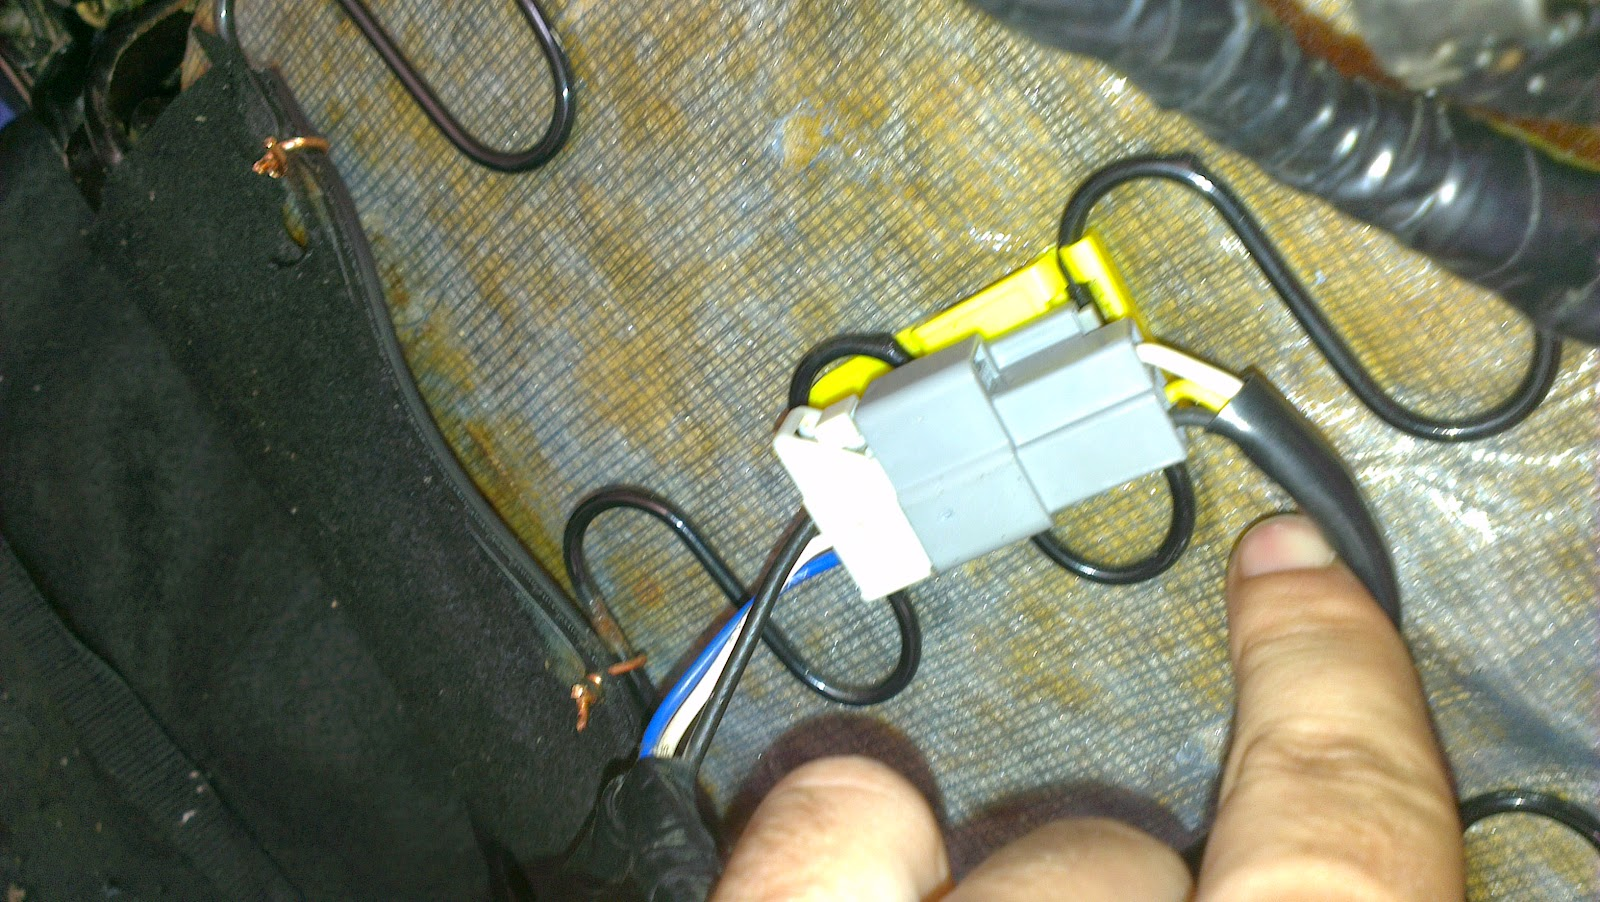 350z Power Heated Seats Wiring Wire Diagram Https Lh6googleusercontentcom G0 Imag0758